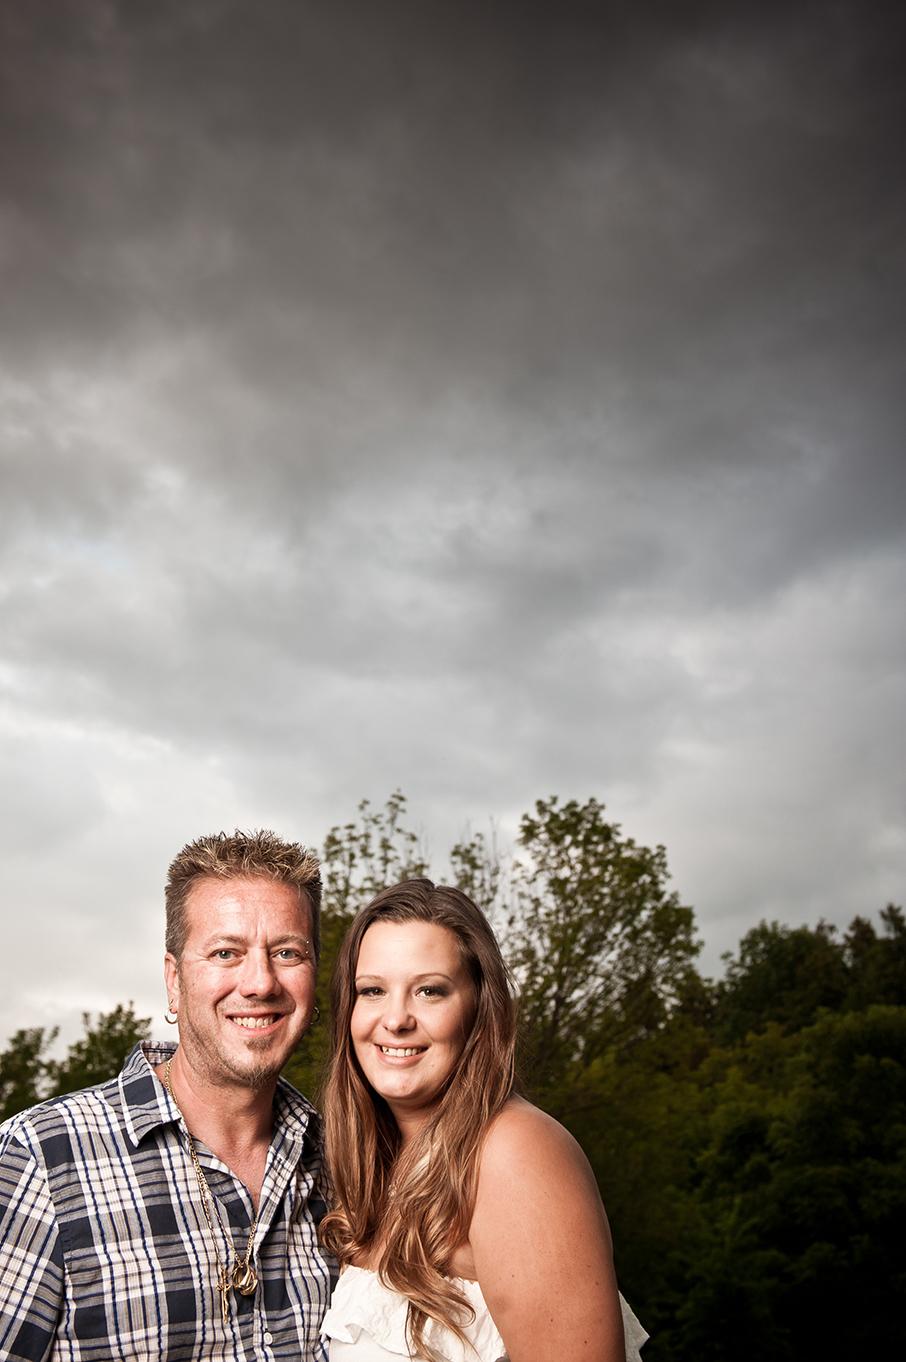 Amanda&Carlo_Engagement-191.jpg